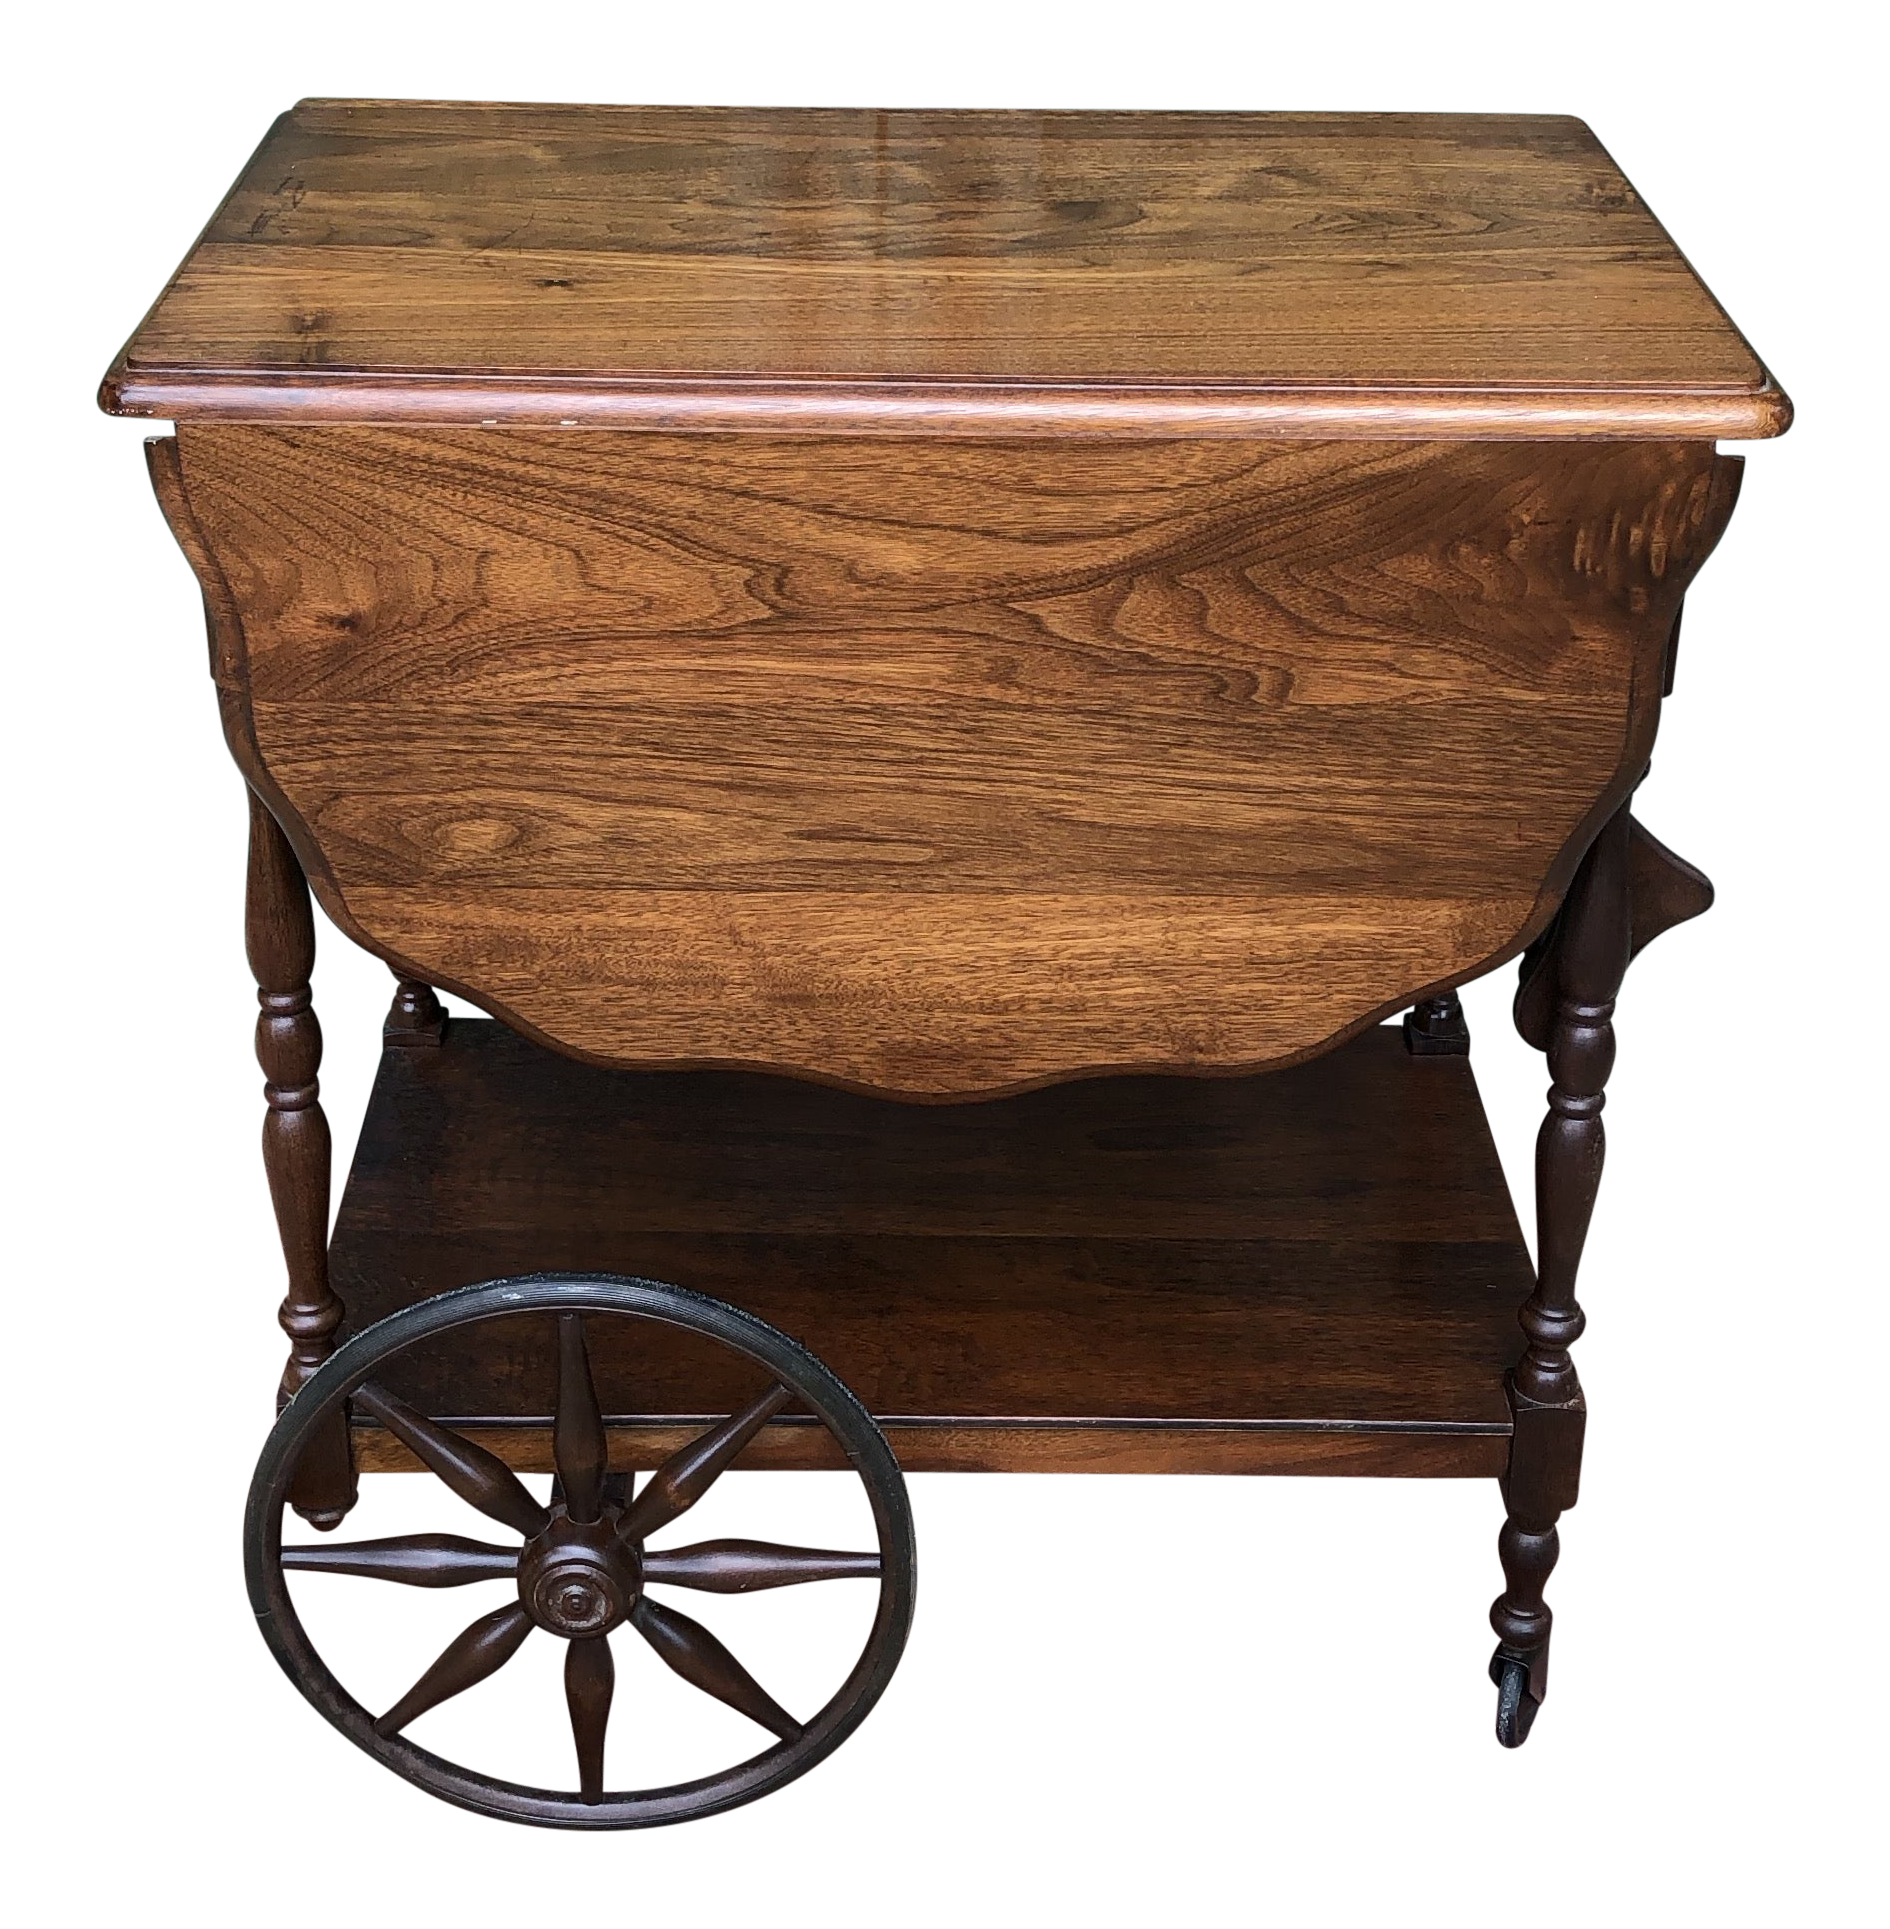 Antique Wood Tea Cart Or Bar Cart With Wheels Chairish